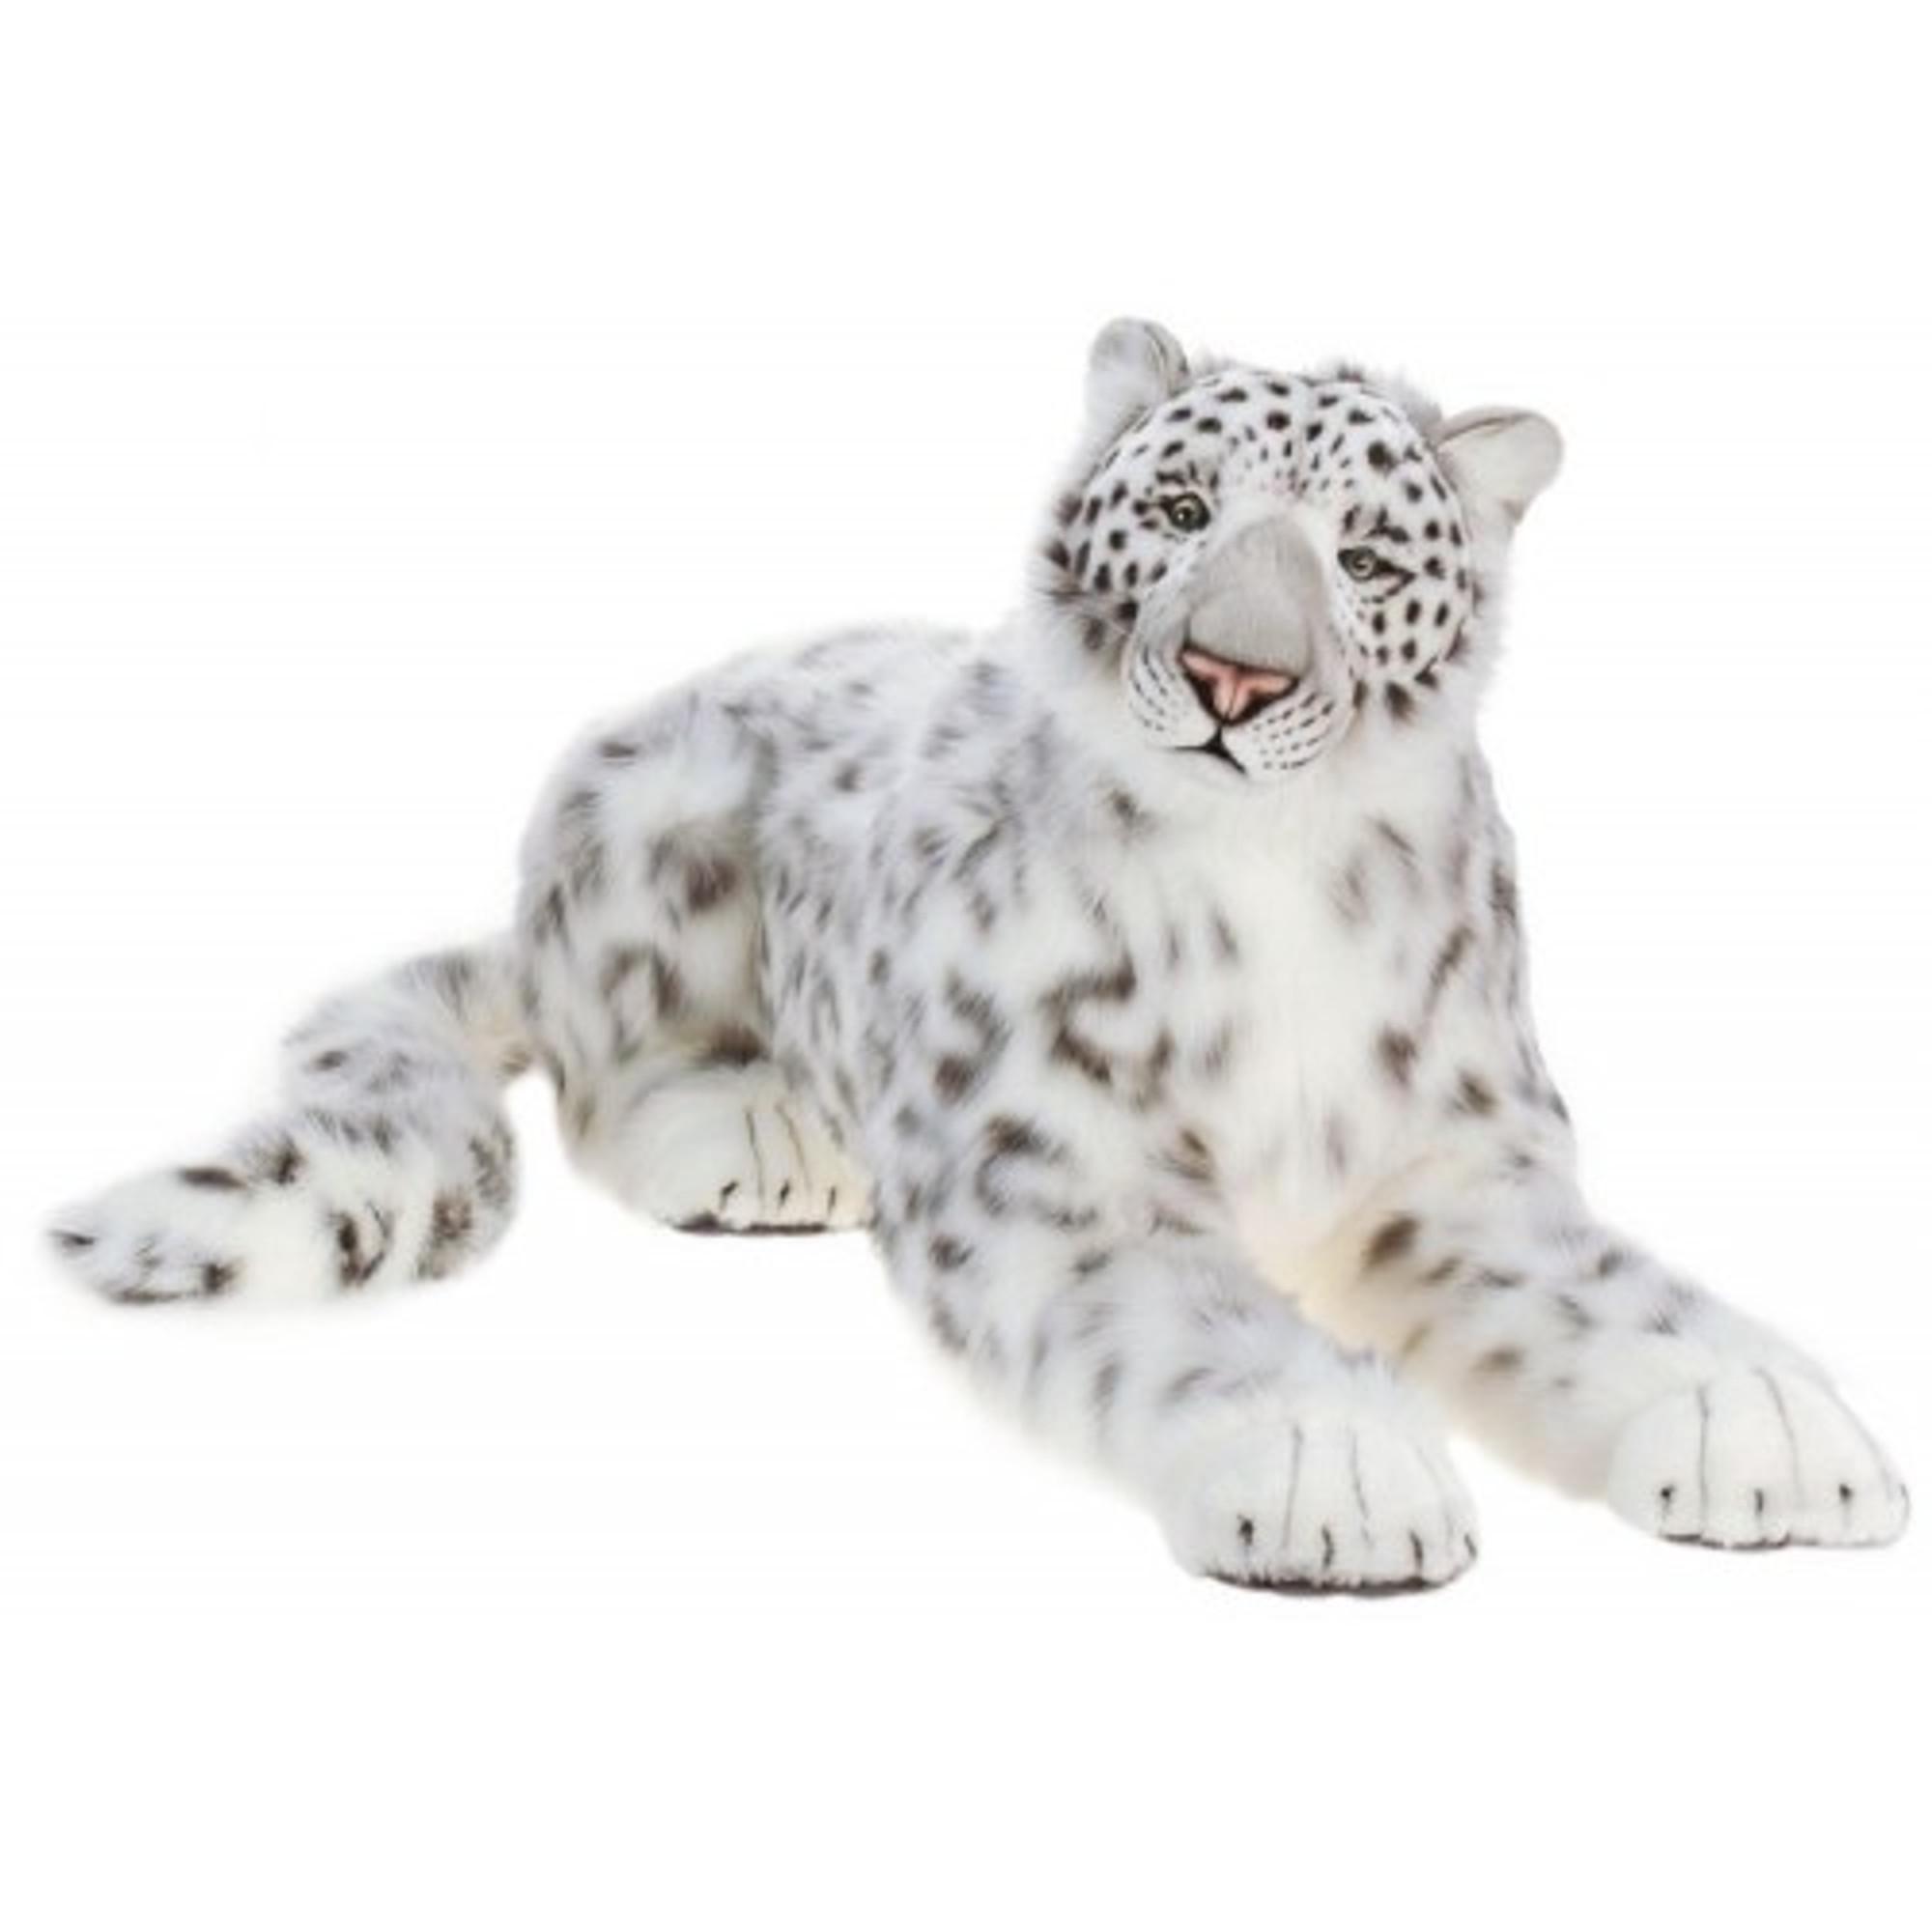 Snow Leopard Giant Stuffed Animal Life Sized Snow